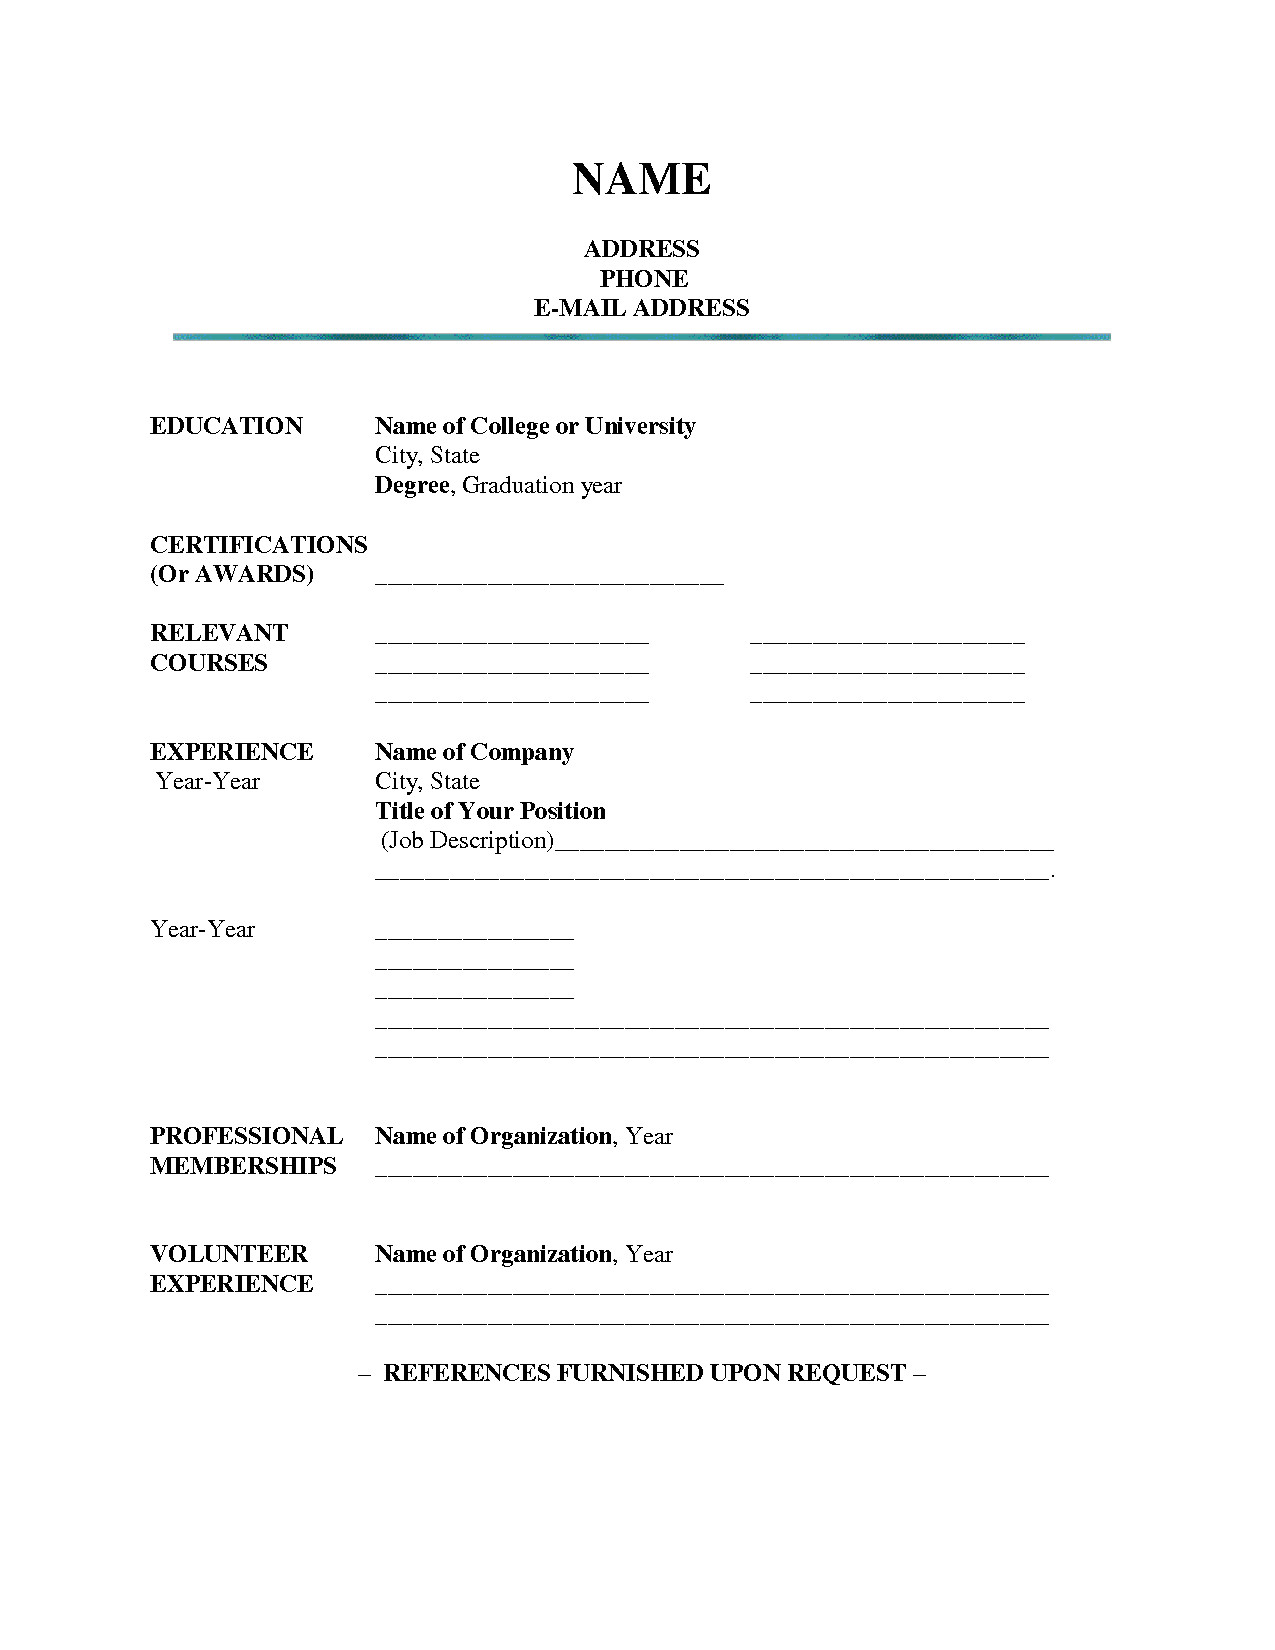 Blank Template Of Resume 7 8 Resume Blank format Pdf Resumename Com